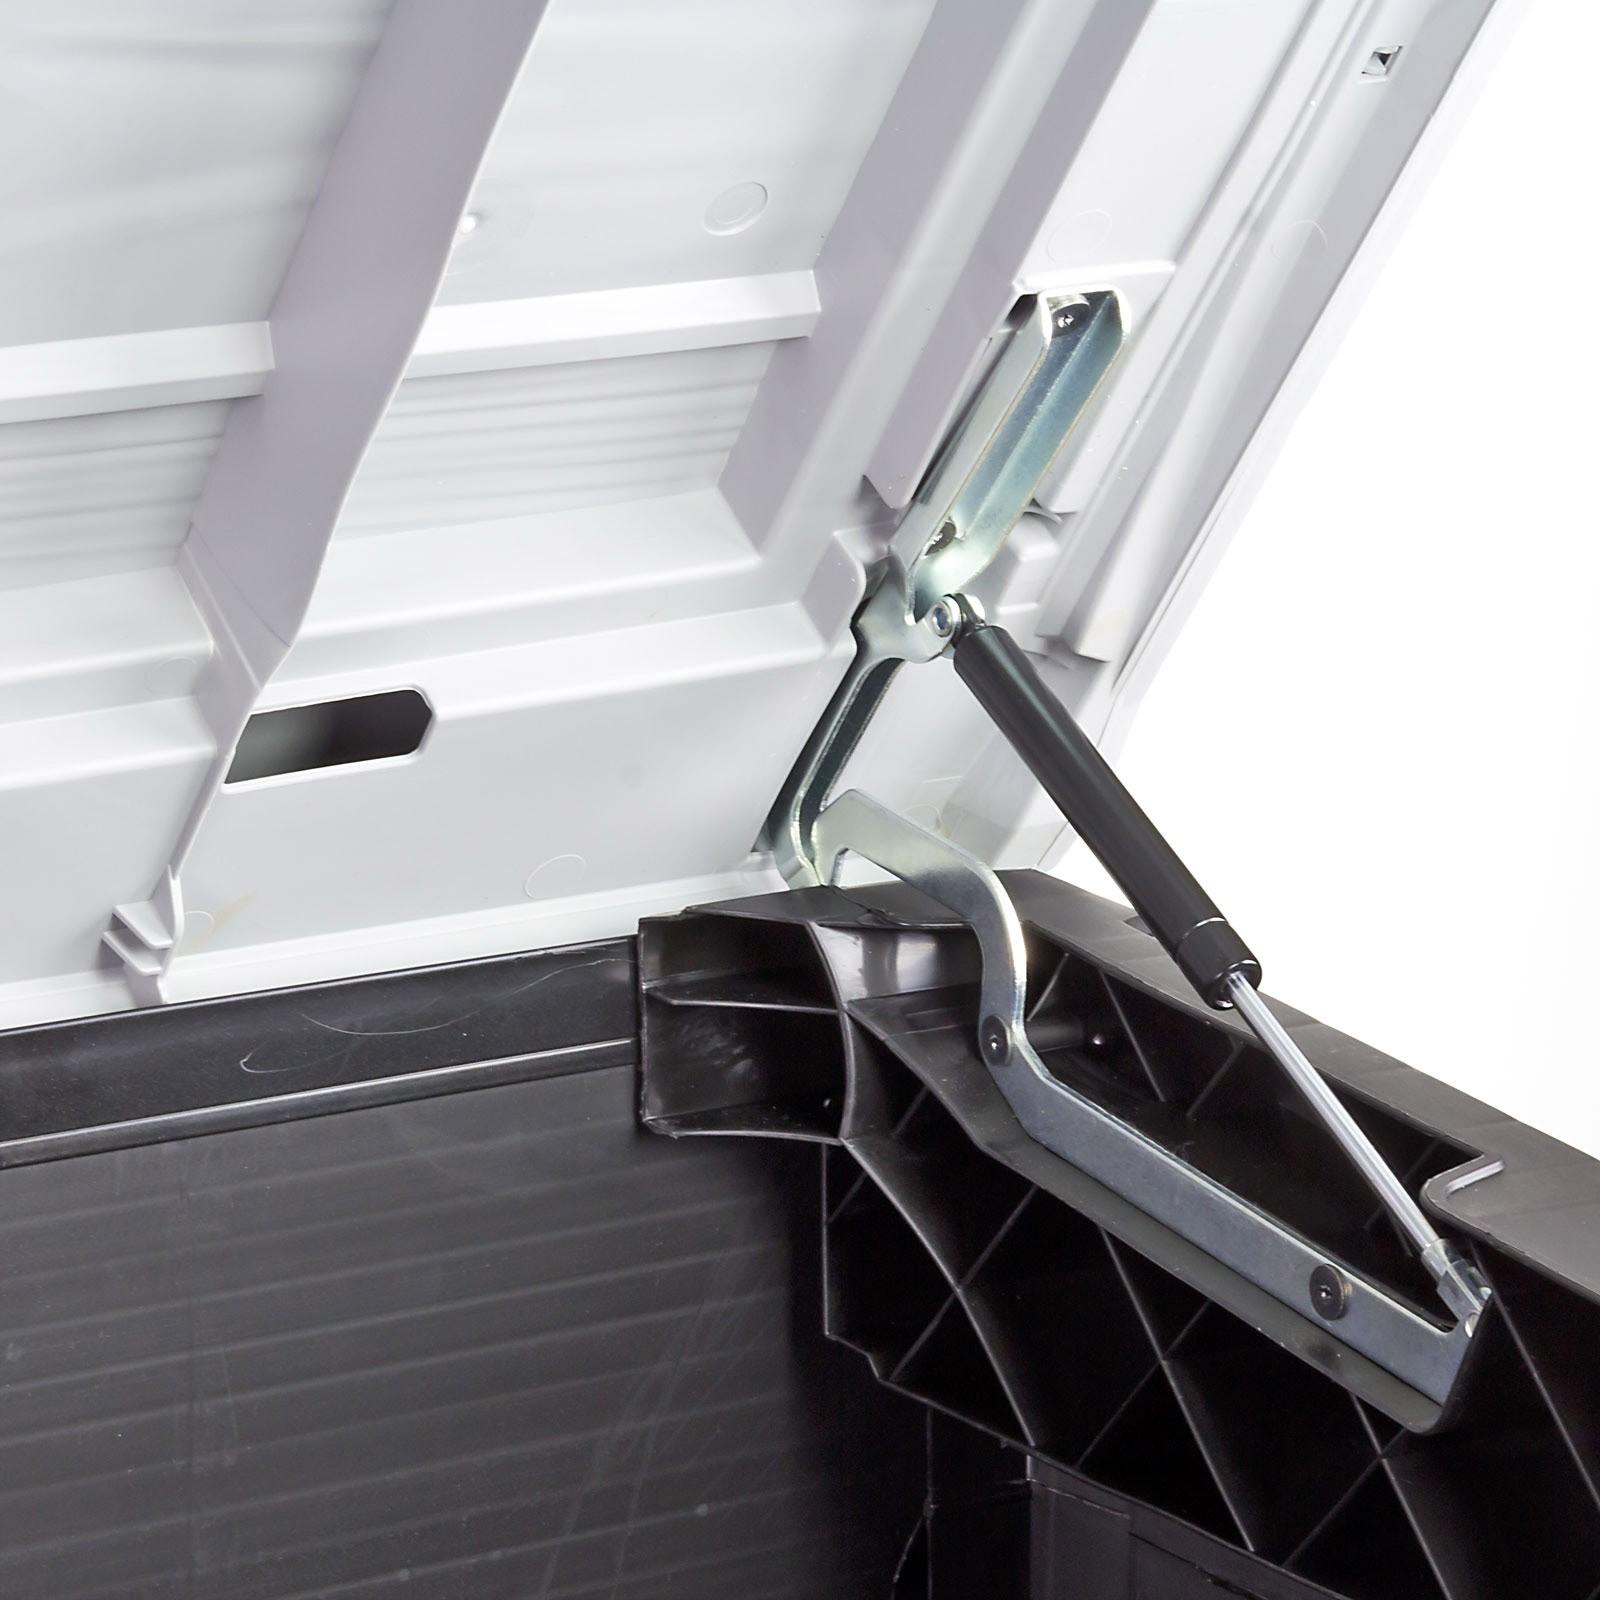 Mulltonnenbox Mulltonnen Sichtschutz Xl Fur 2x240 Liter Behalter